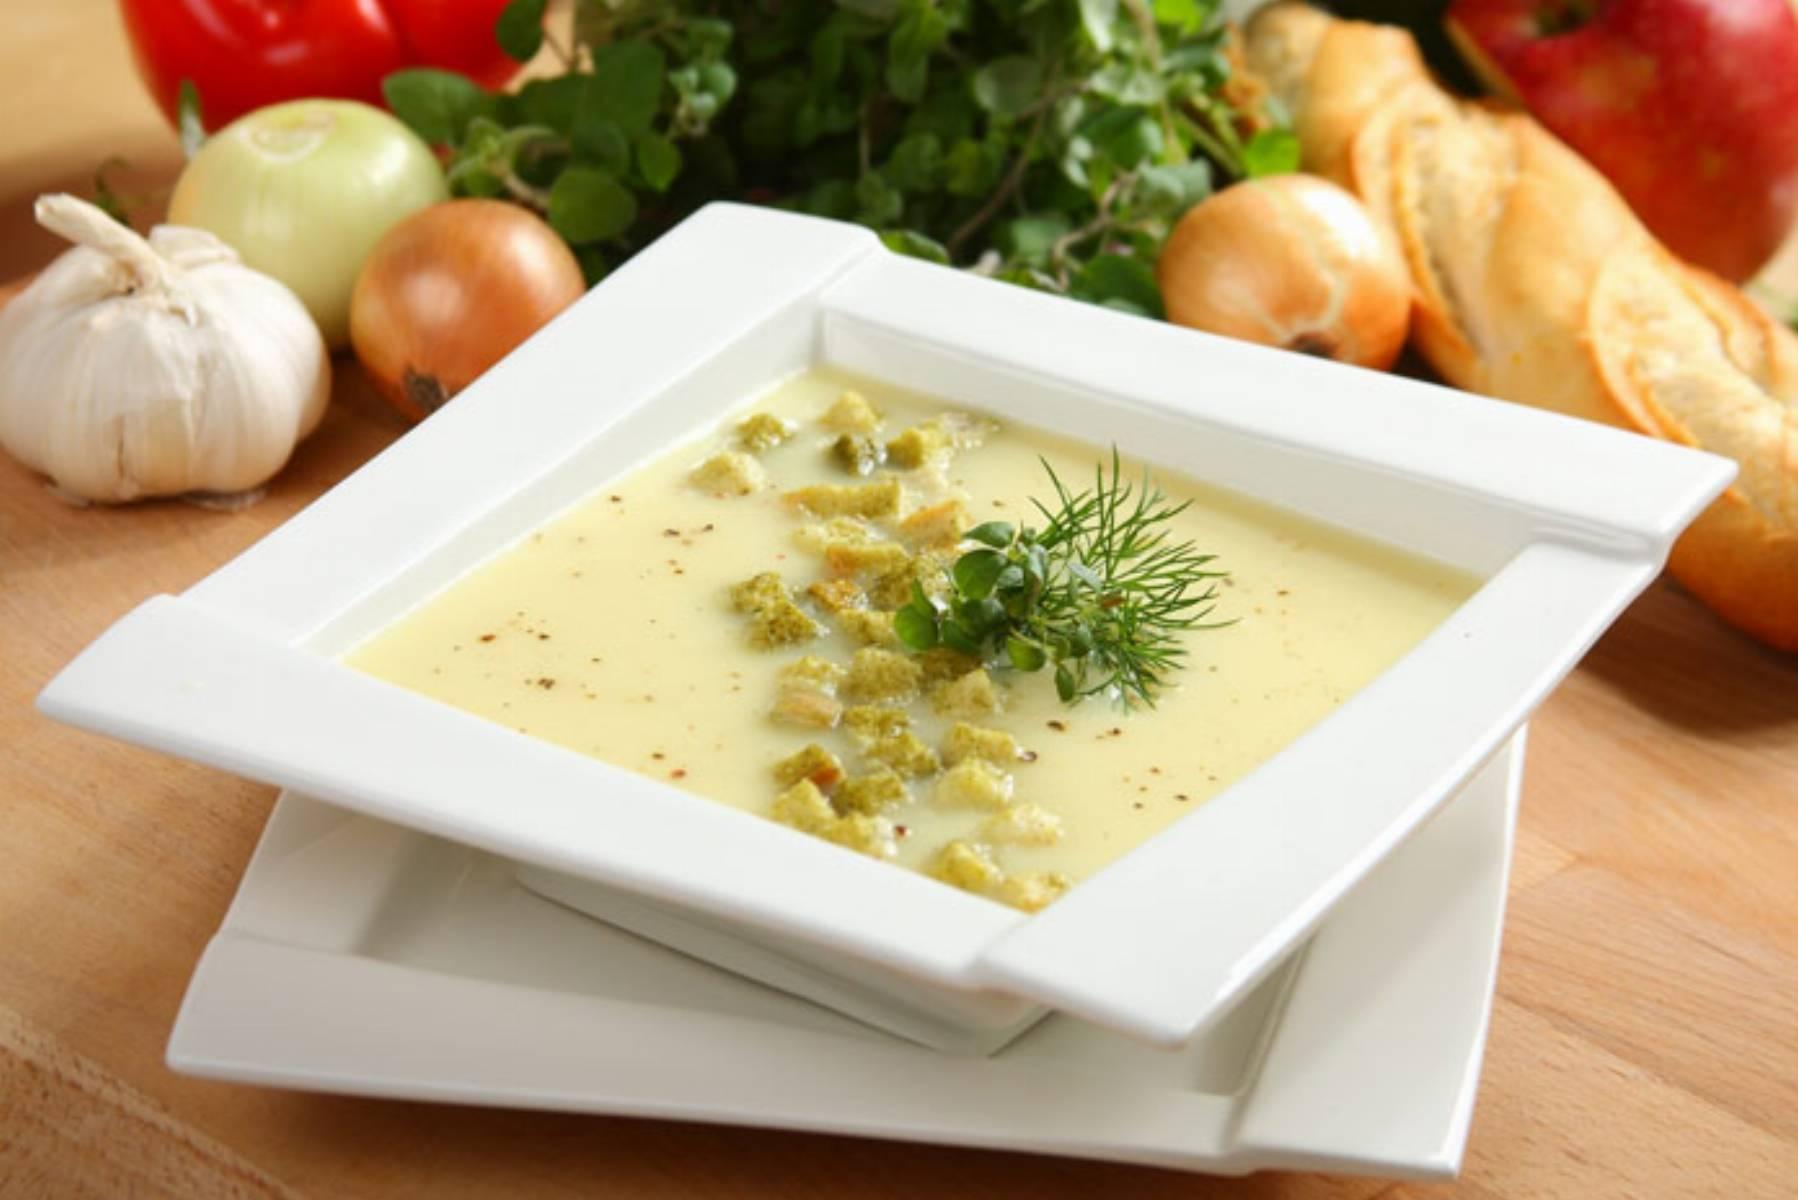 Kremowa-zupa-selerowa